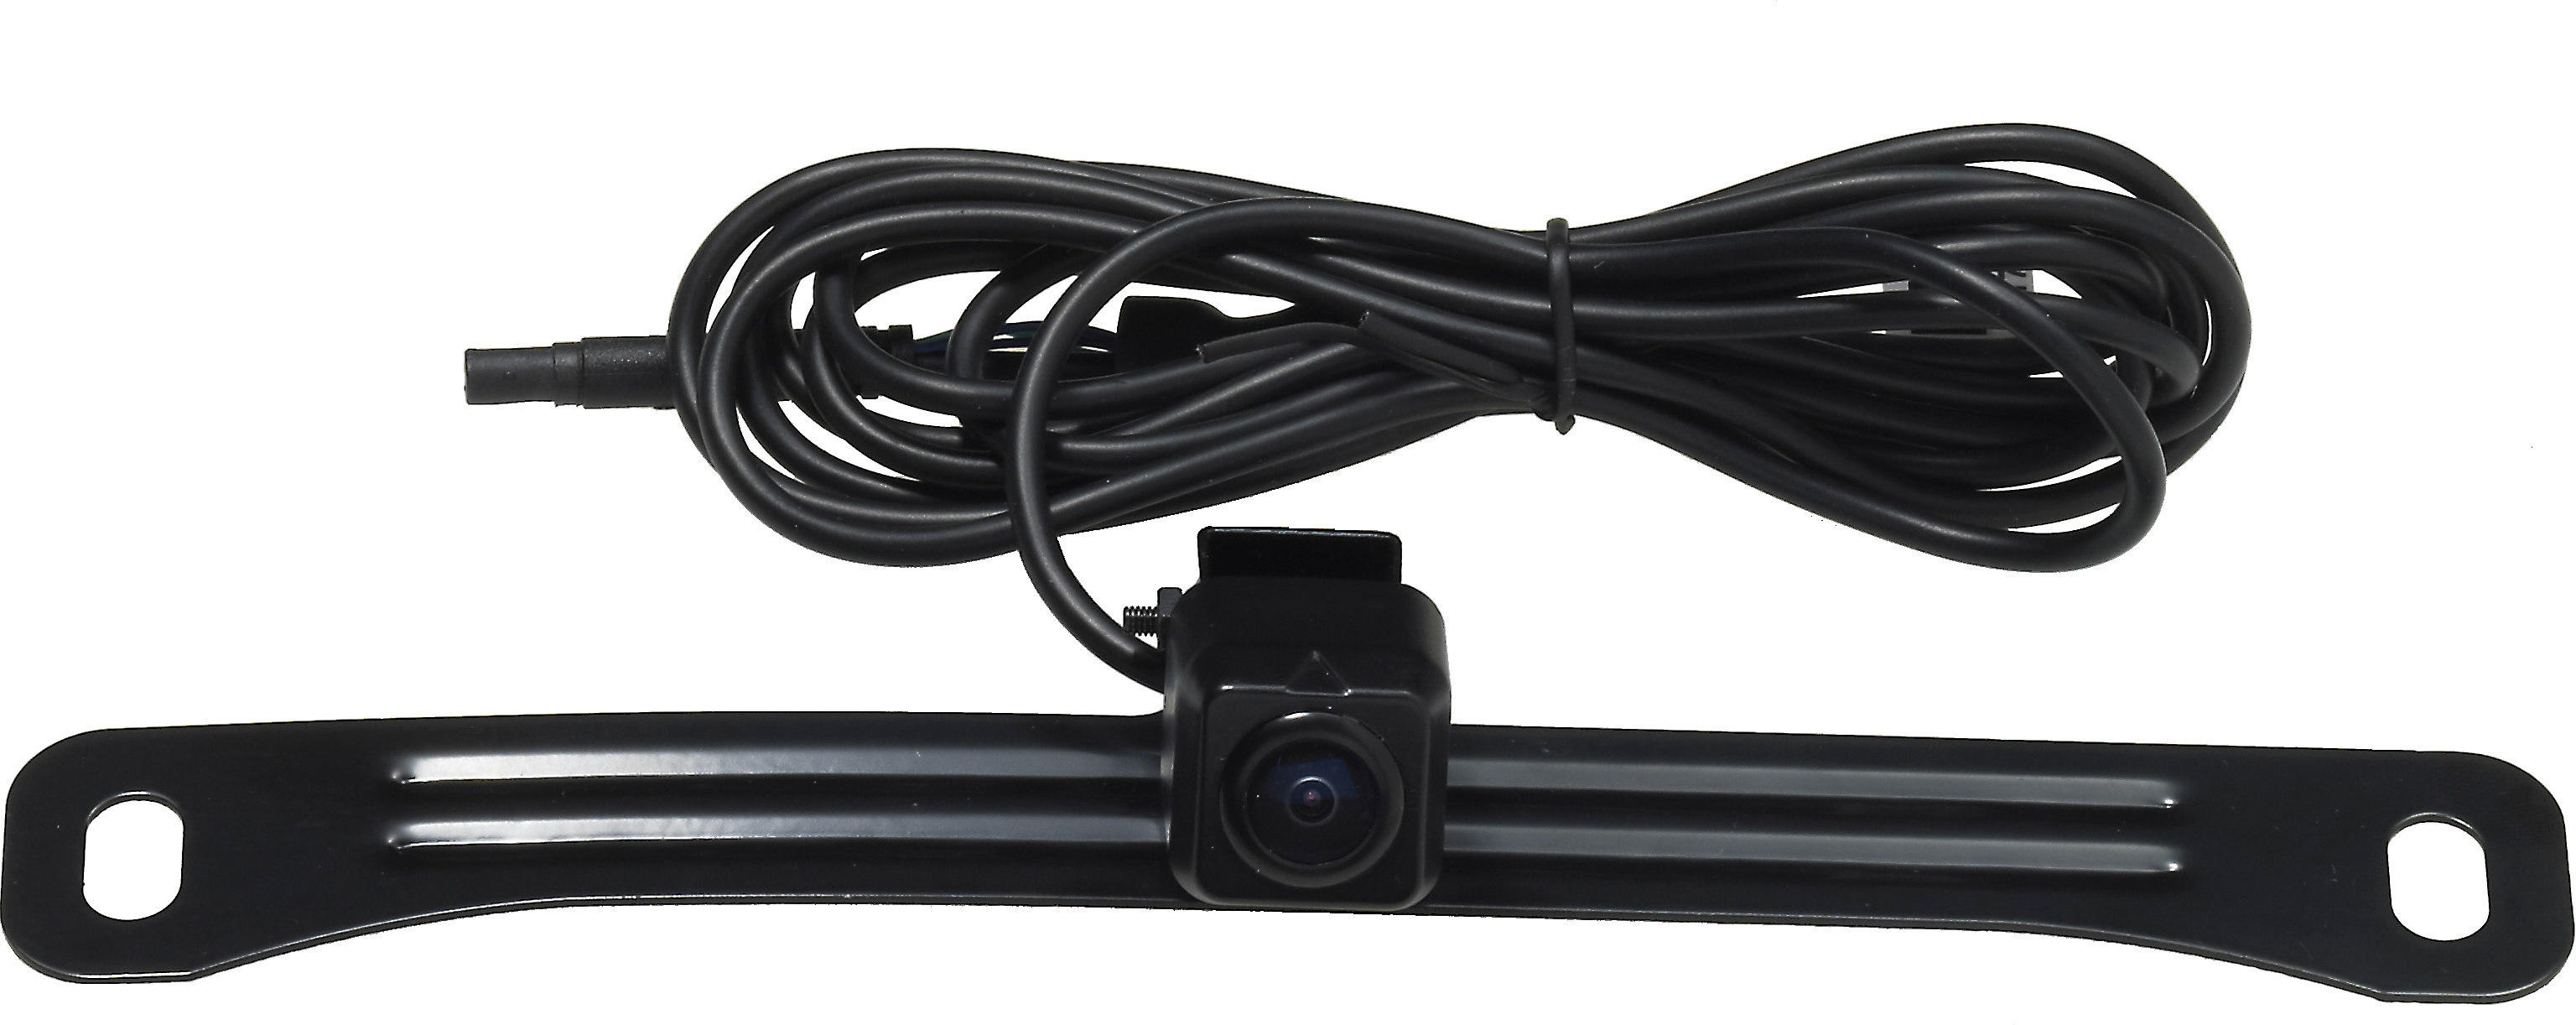 Voxx License Plate Backup Rear View Camera ACA800